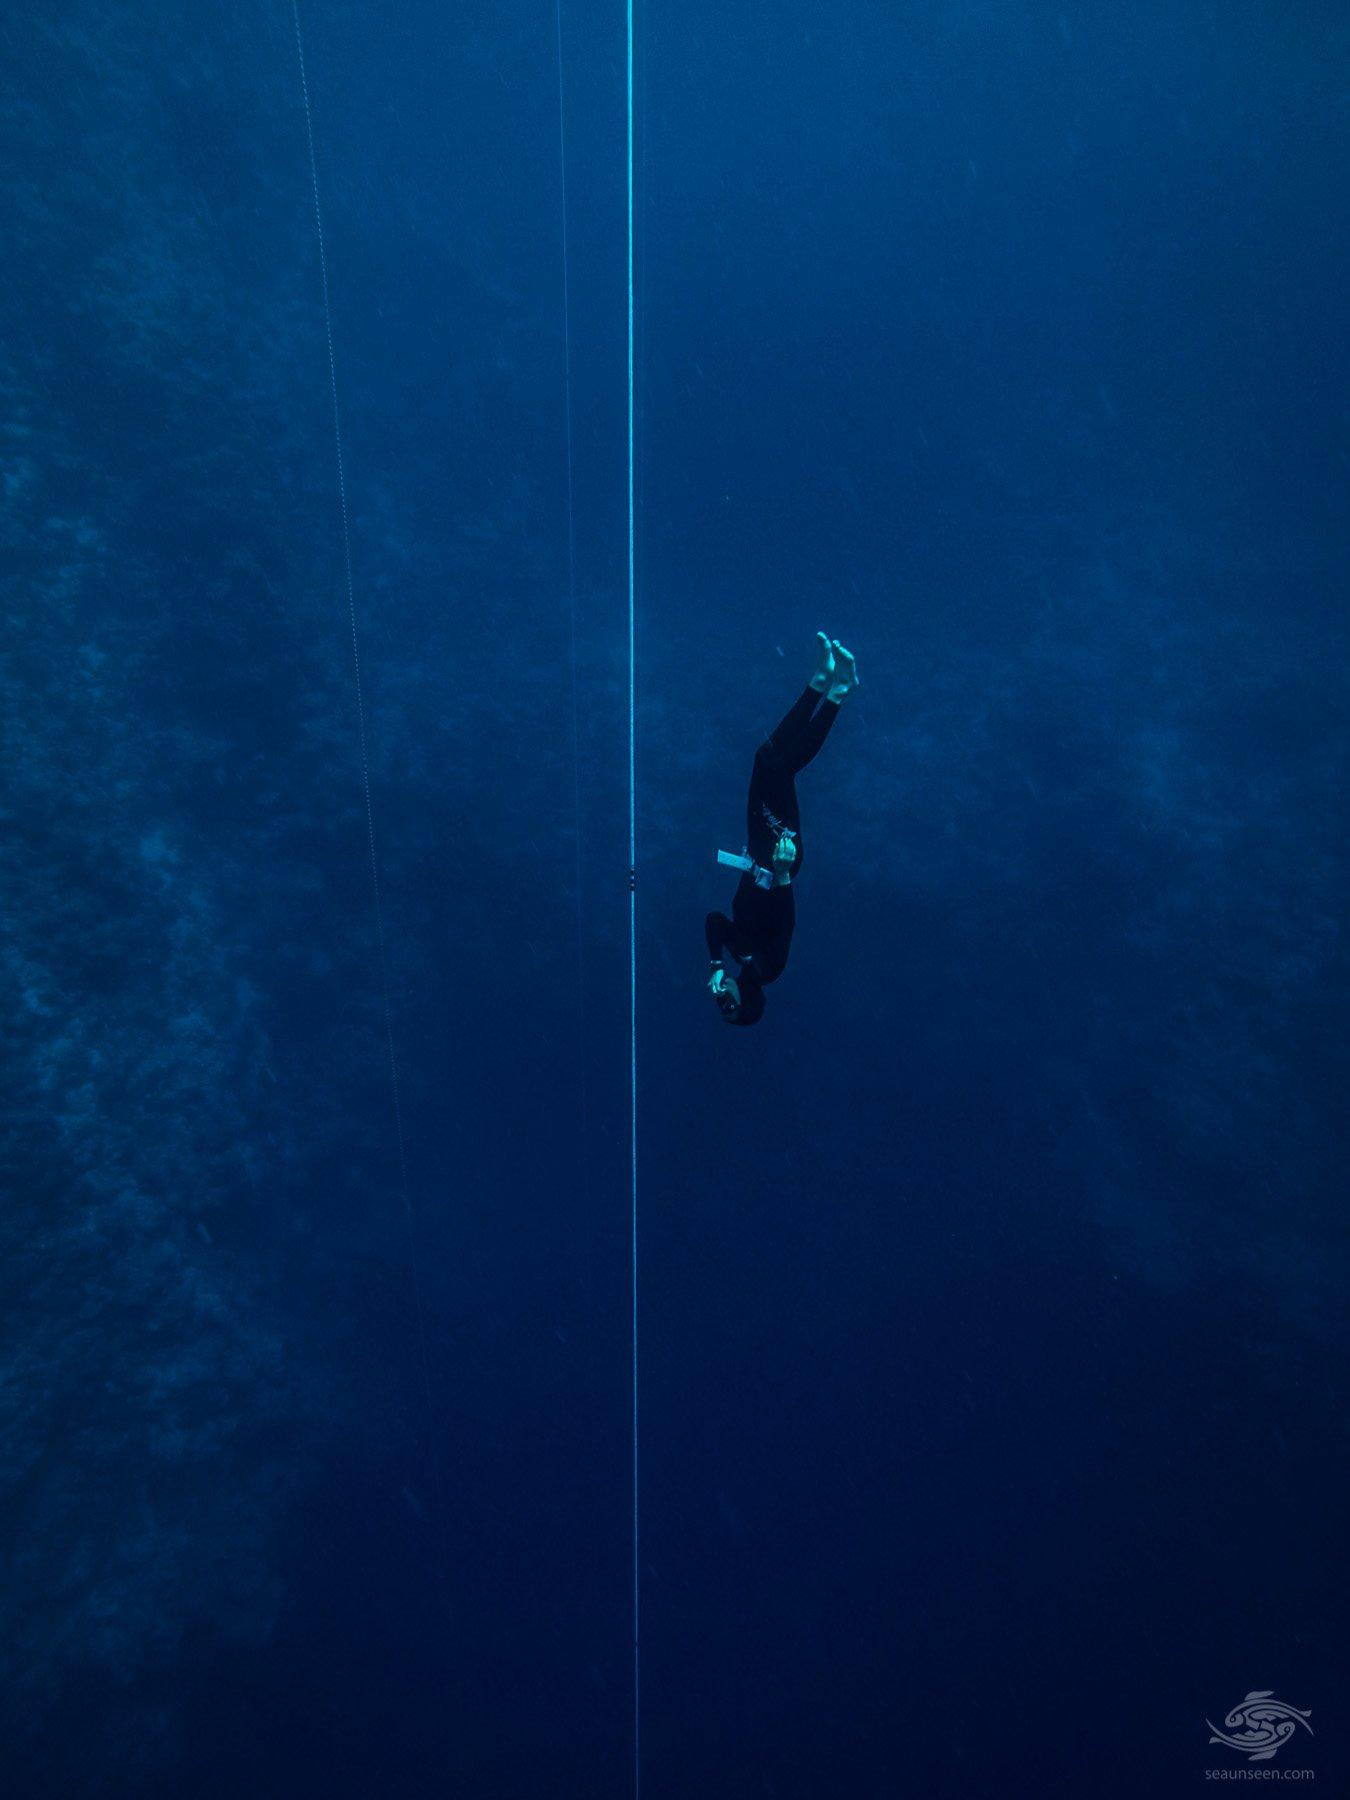 Freedive Freefall 2